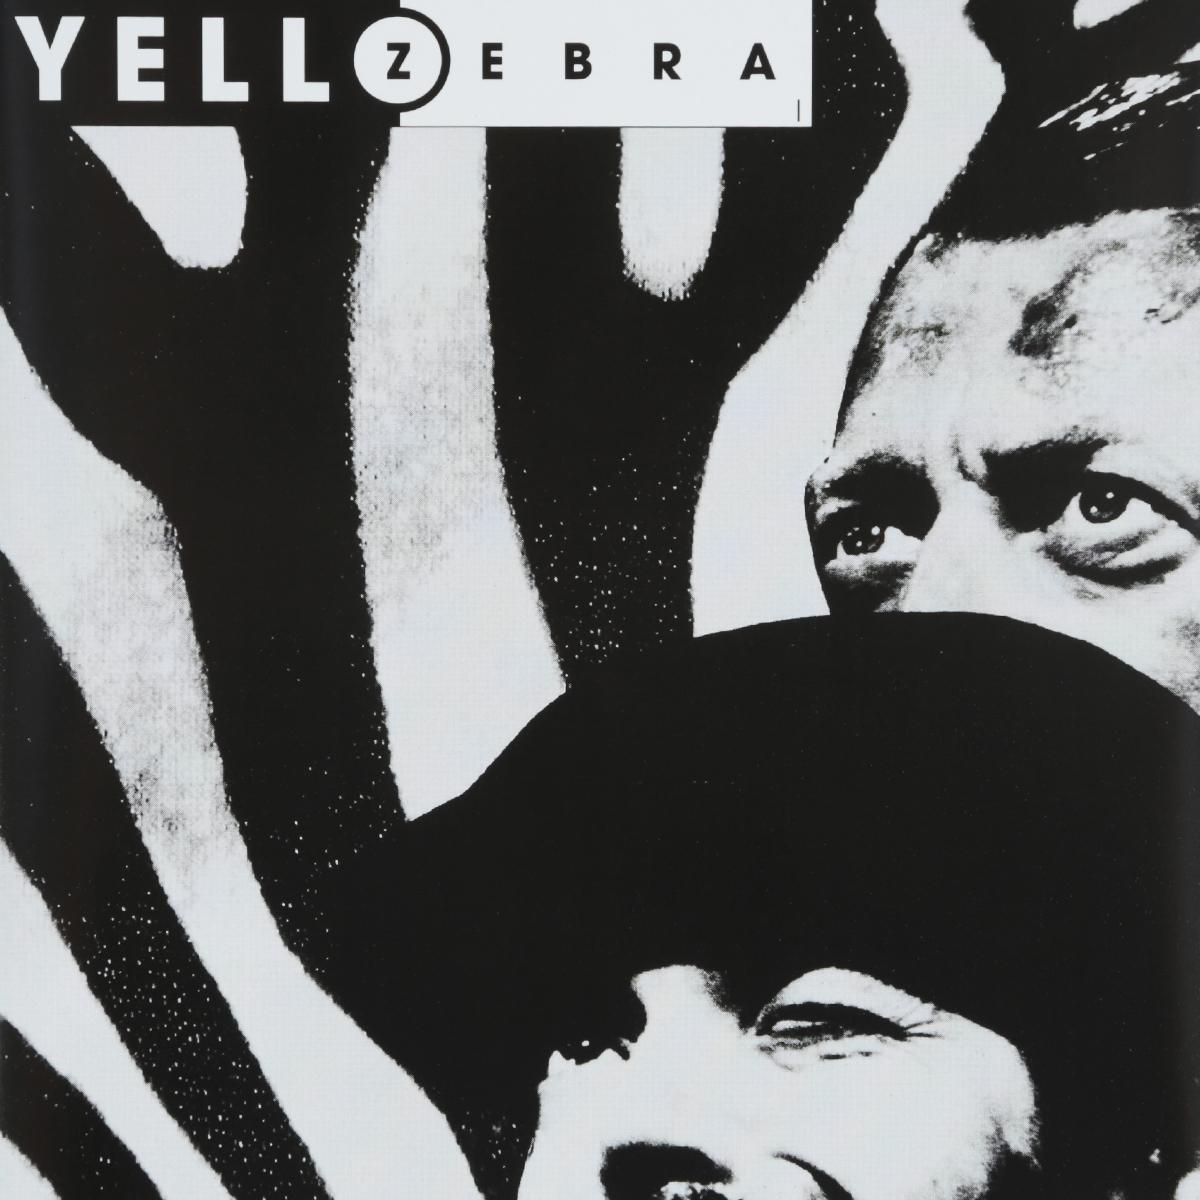 Yello Yello. Zebra yello live in berlin